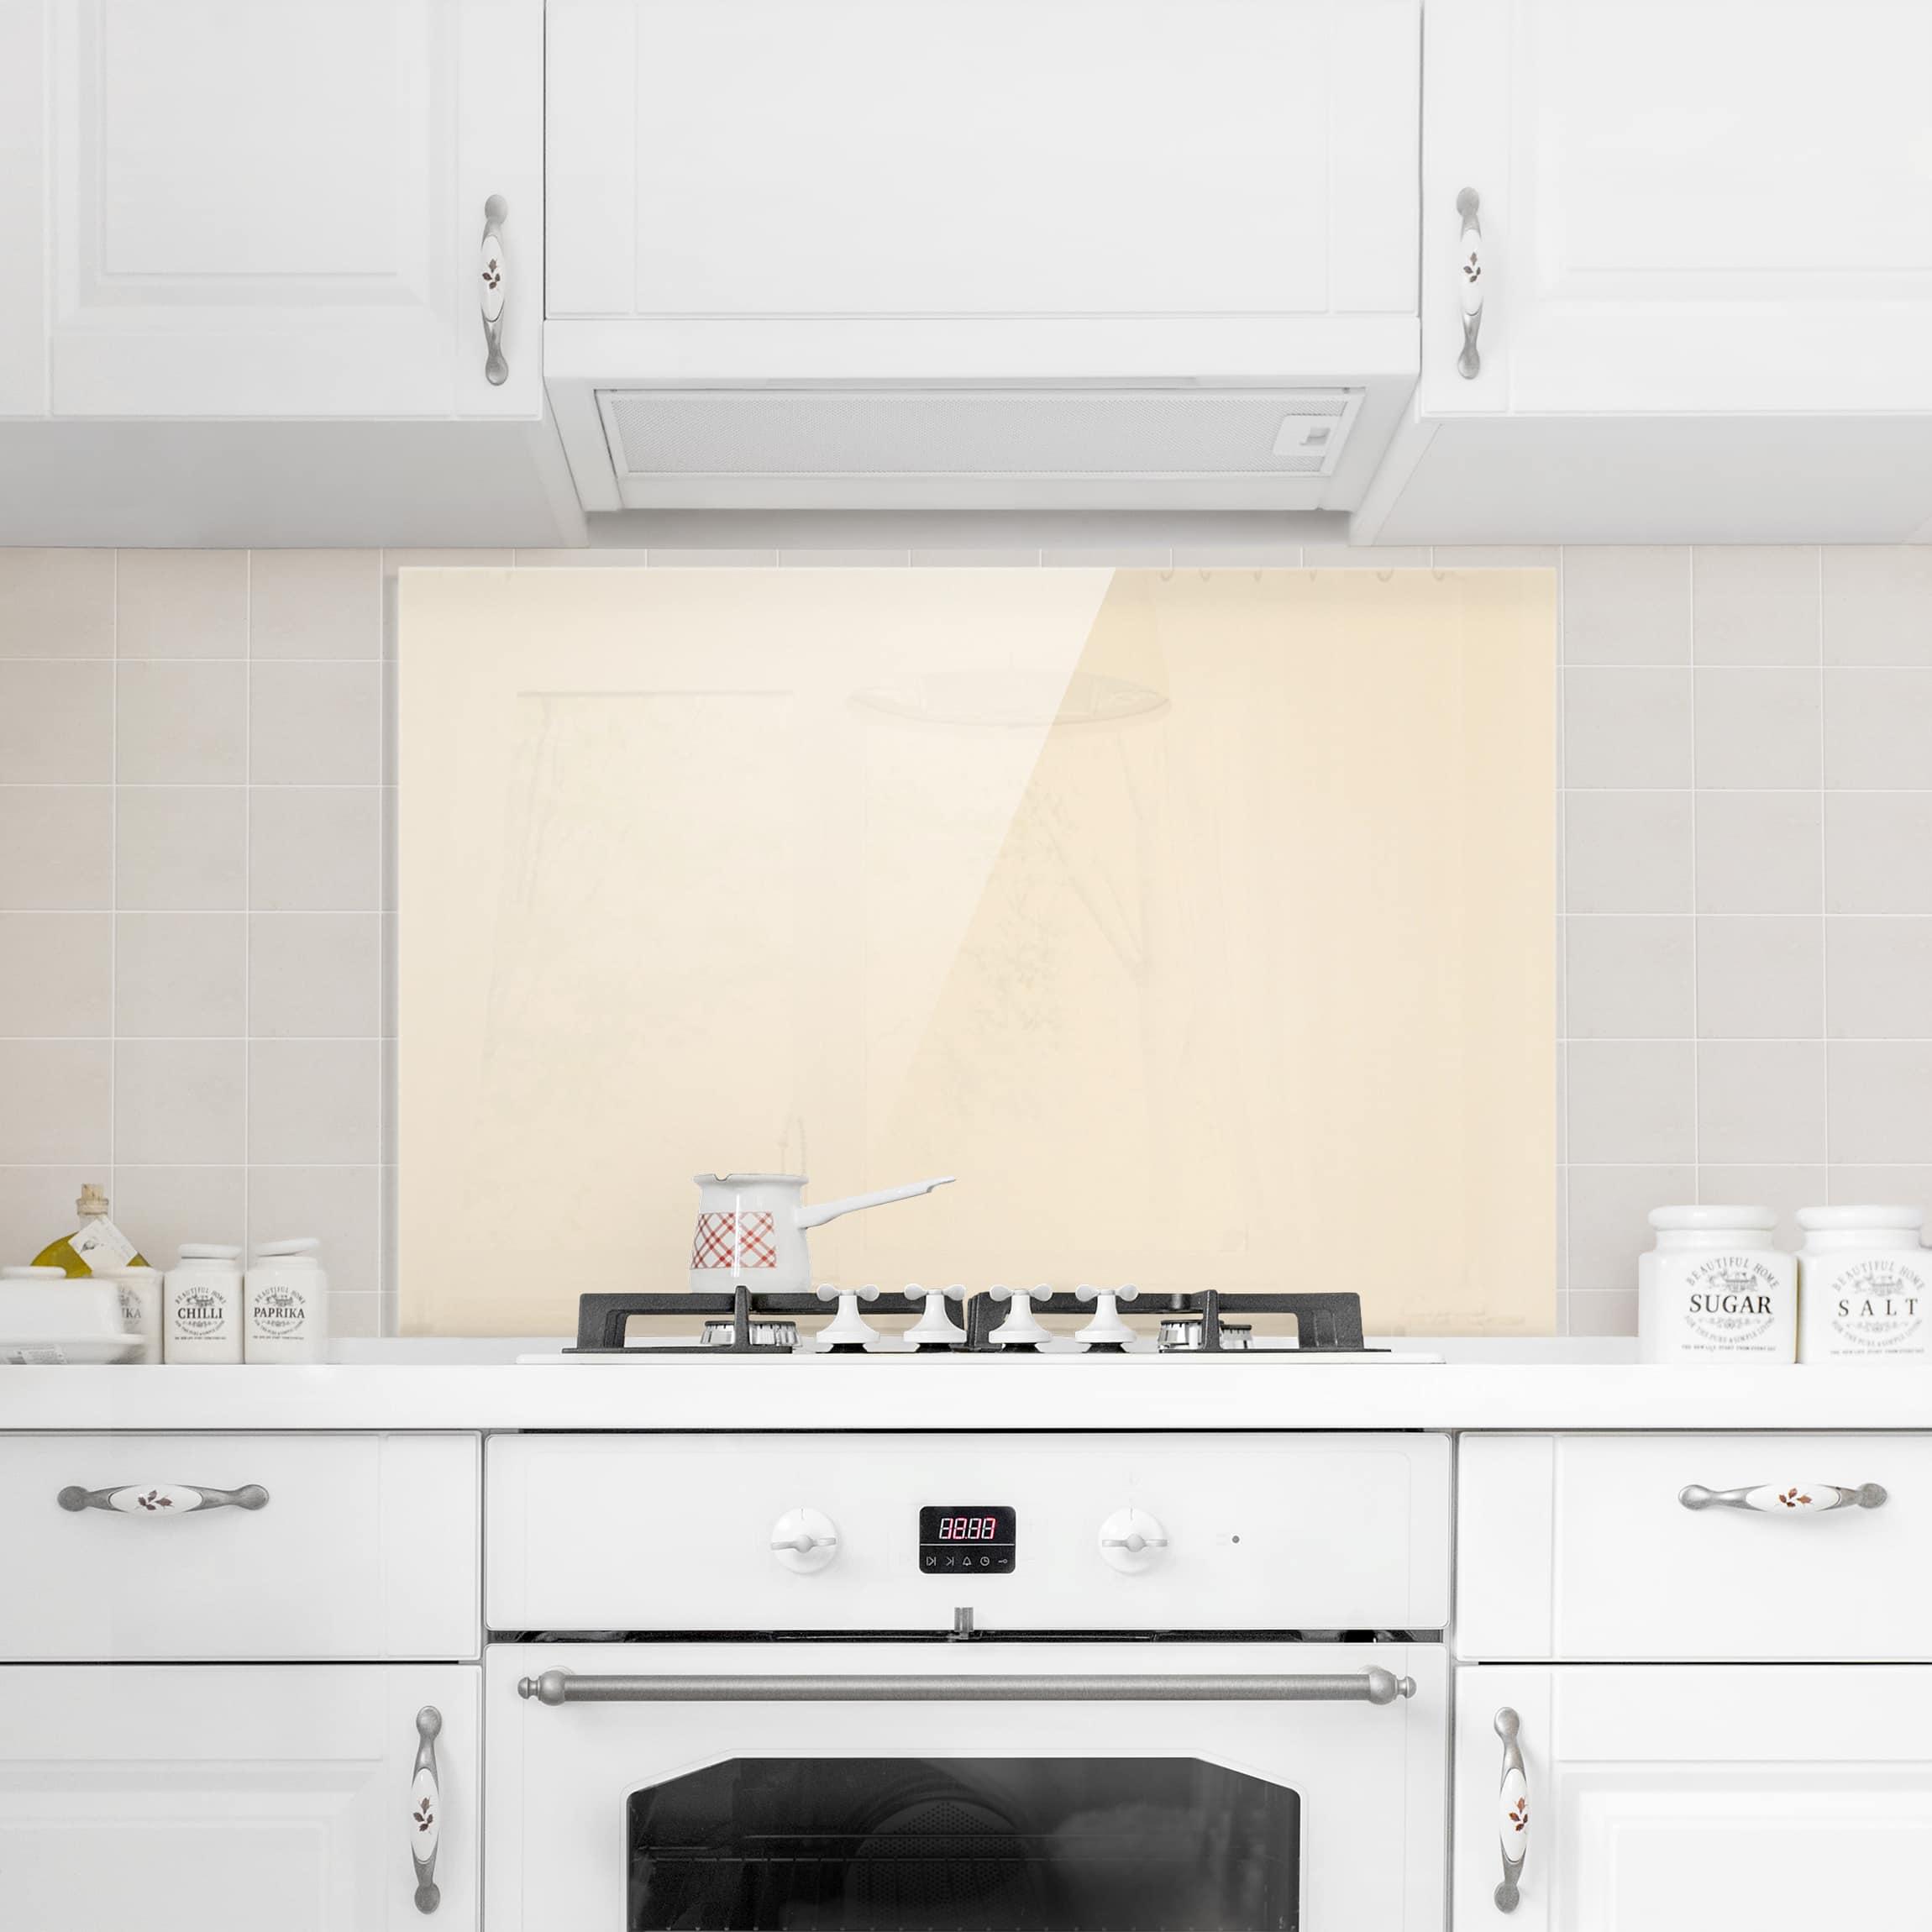 spritzschutz glas cr me quer 2 3. Black Bedroom Furniture Sets. Home Design Ideas